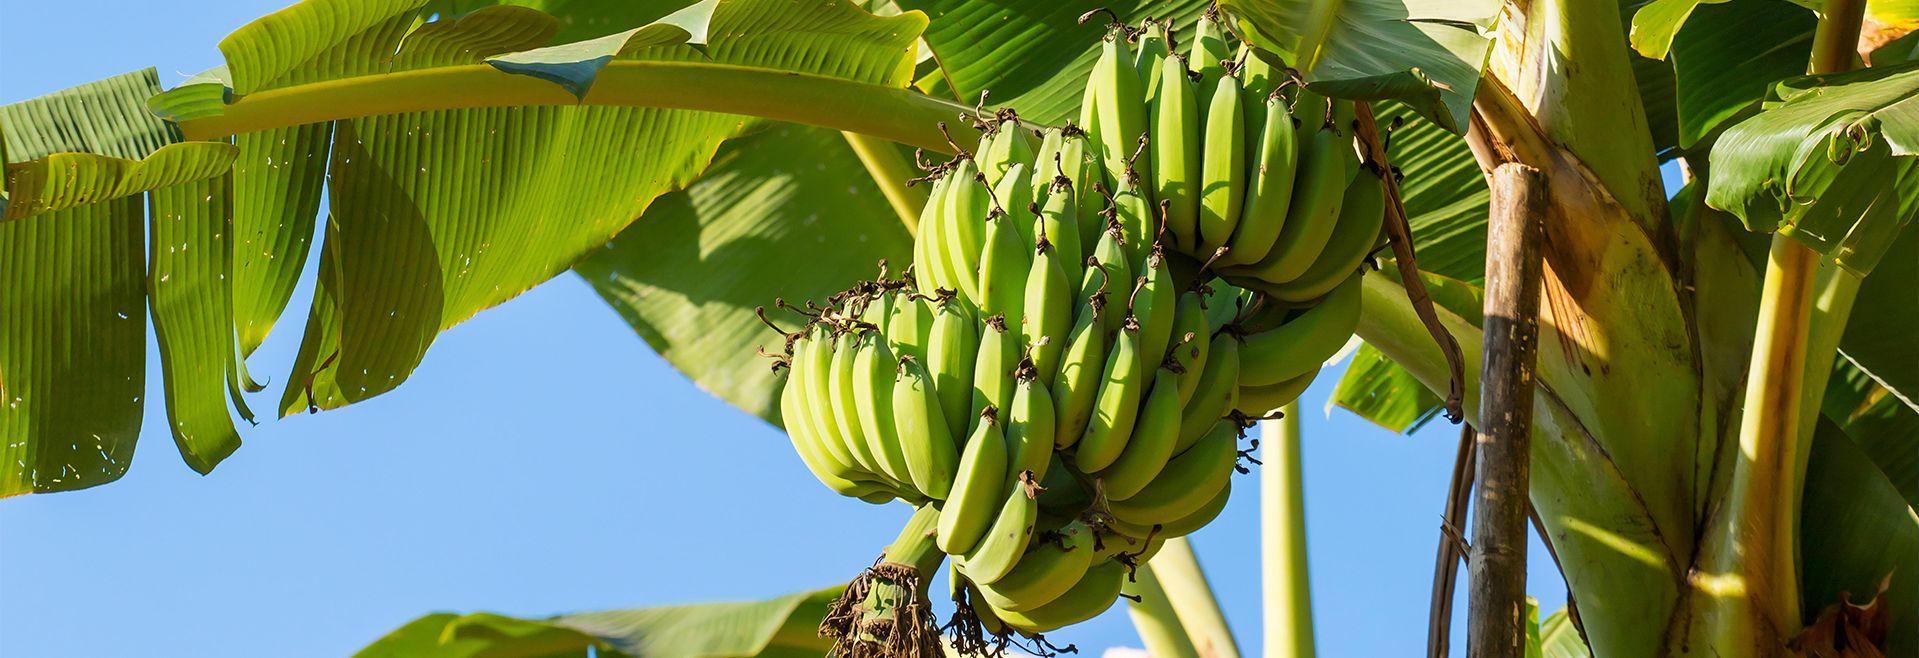 Arbre banana